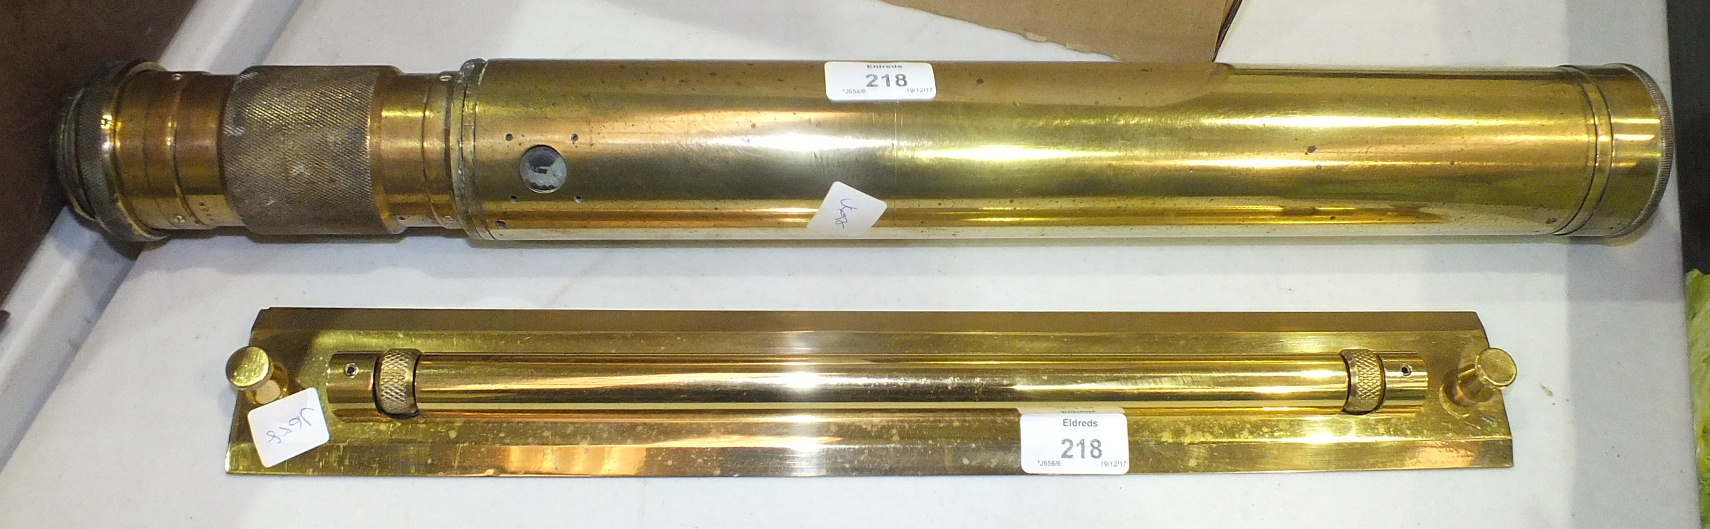 Lot 218 - A brass rolling ruler and a brass gun sight by Ross, London, no.40127, (2).